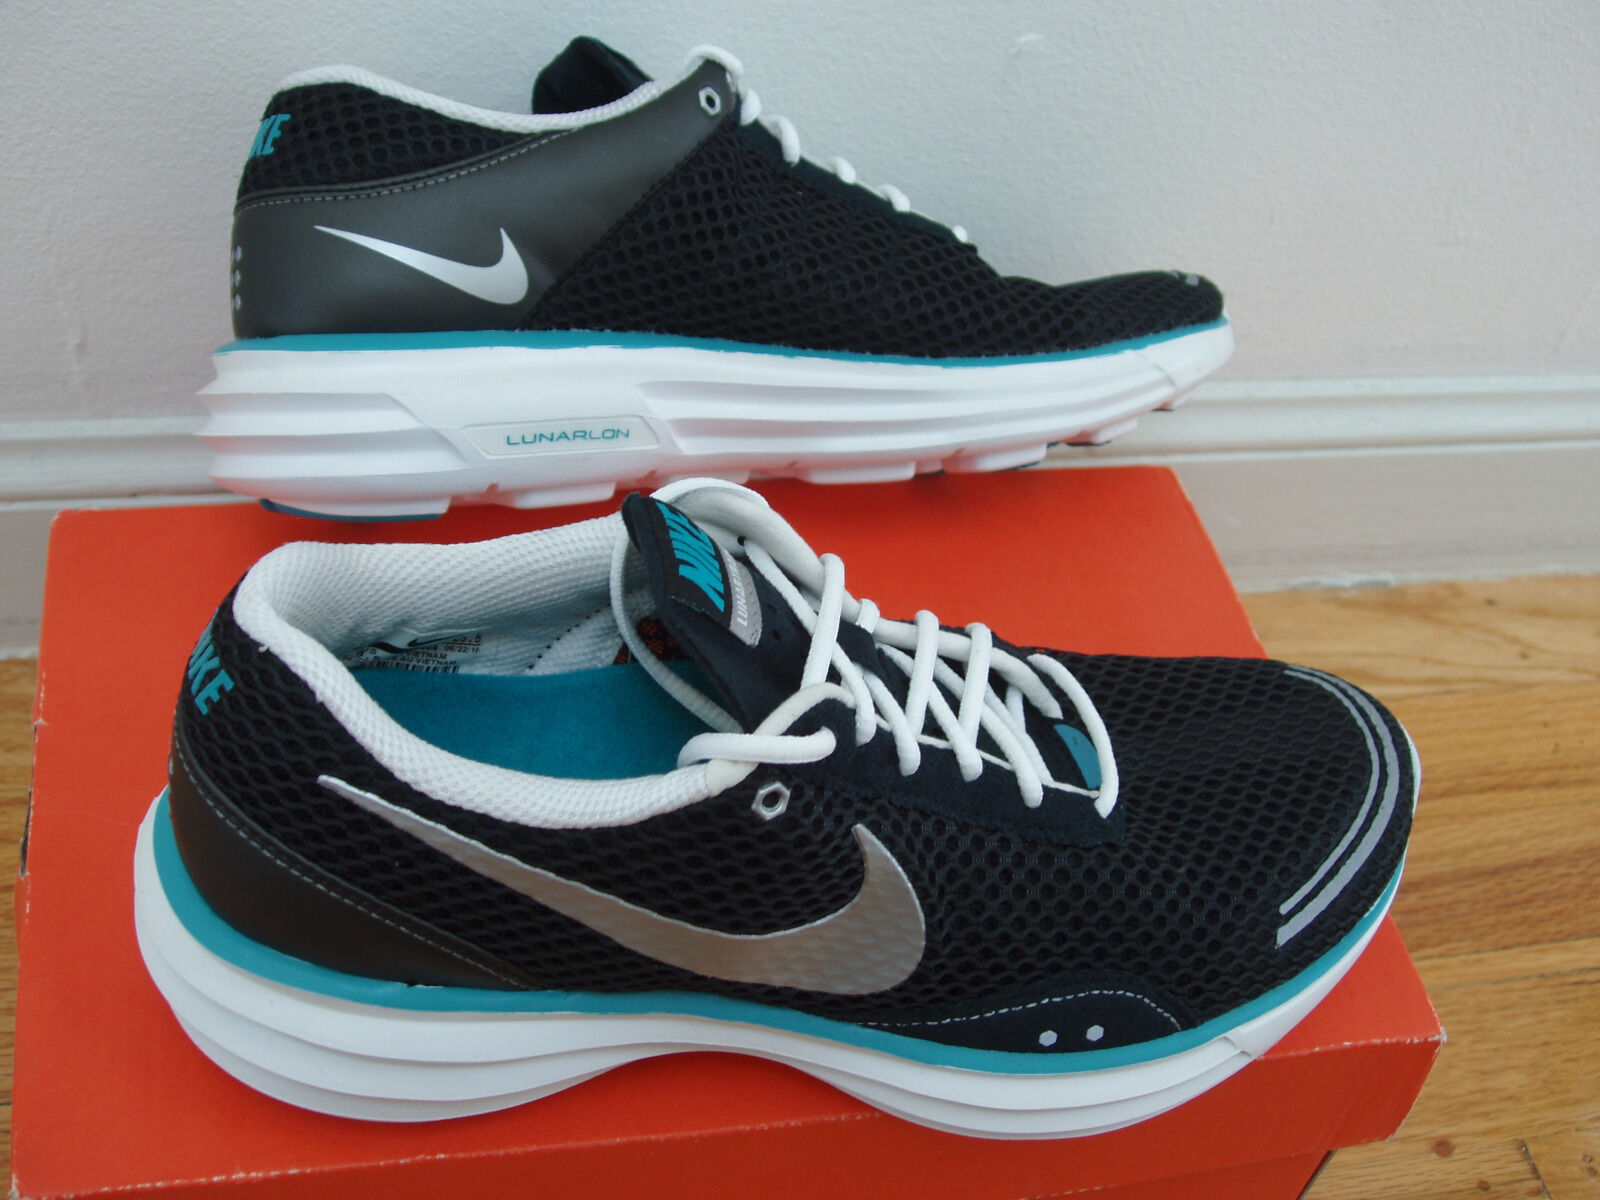 NEW Nike LunarTrainer women 7.5 lunar trainer running shoes black bluee lunarlon